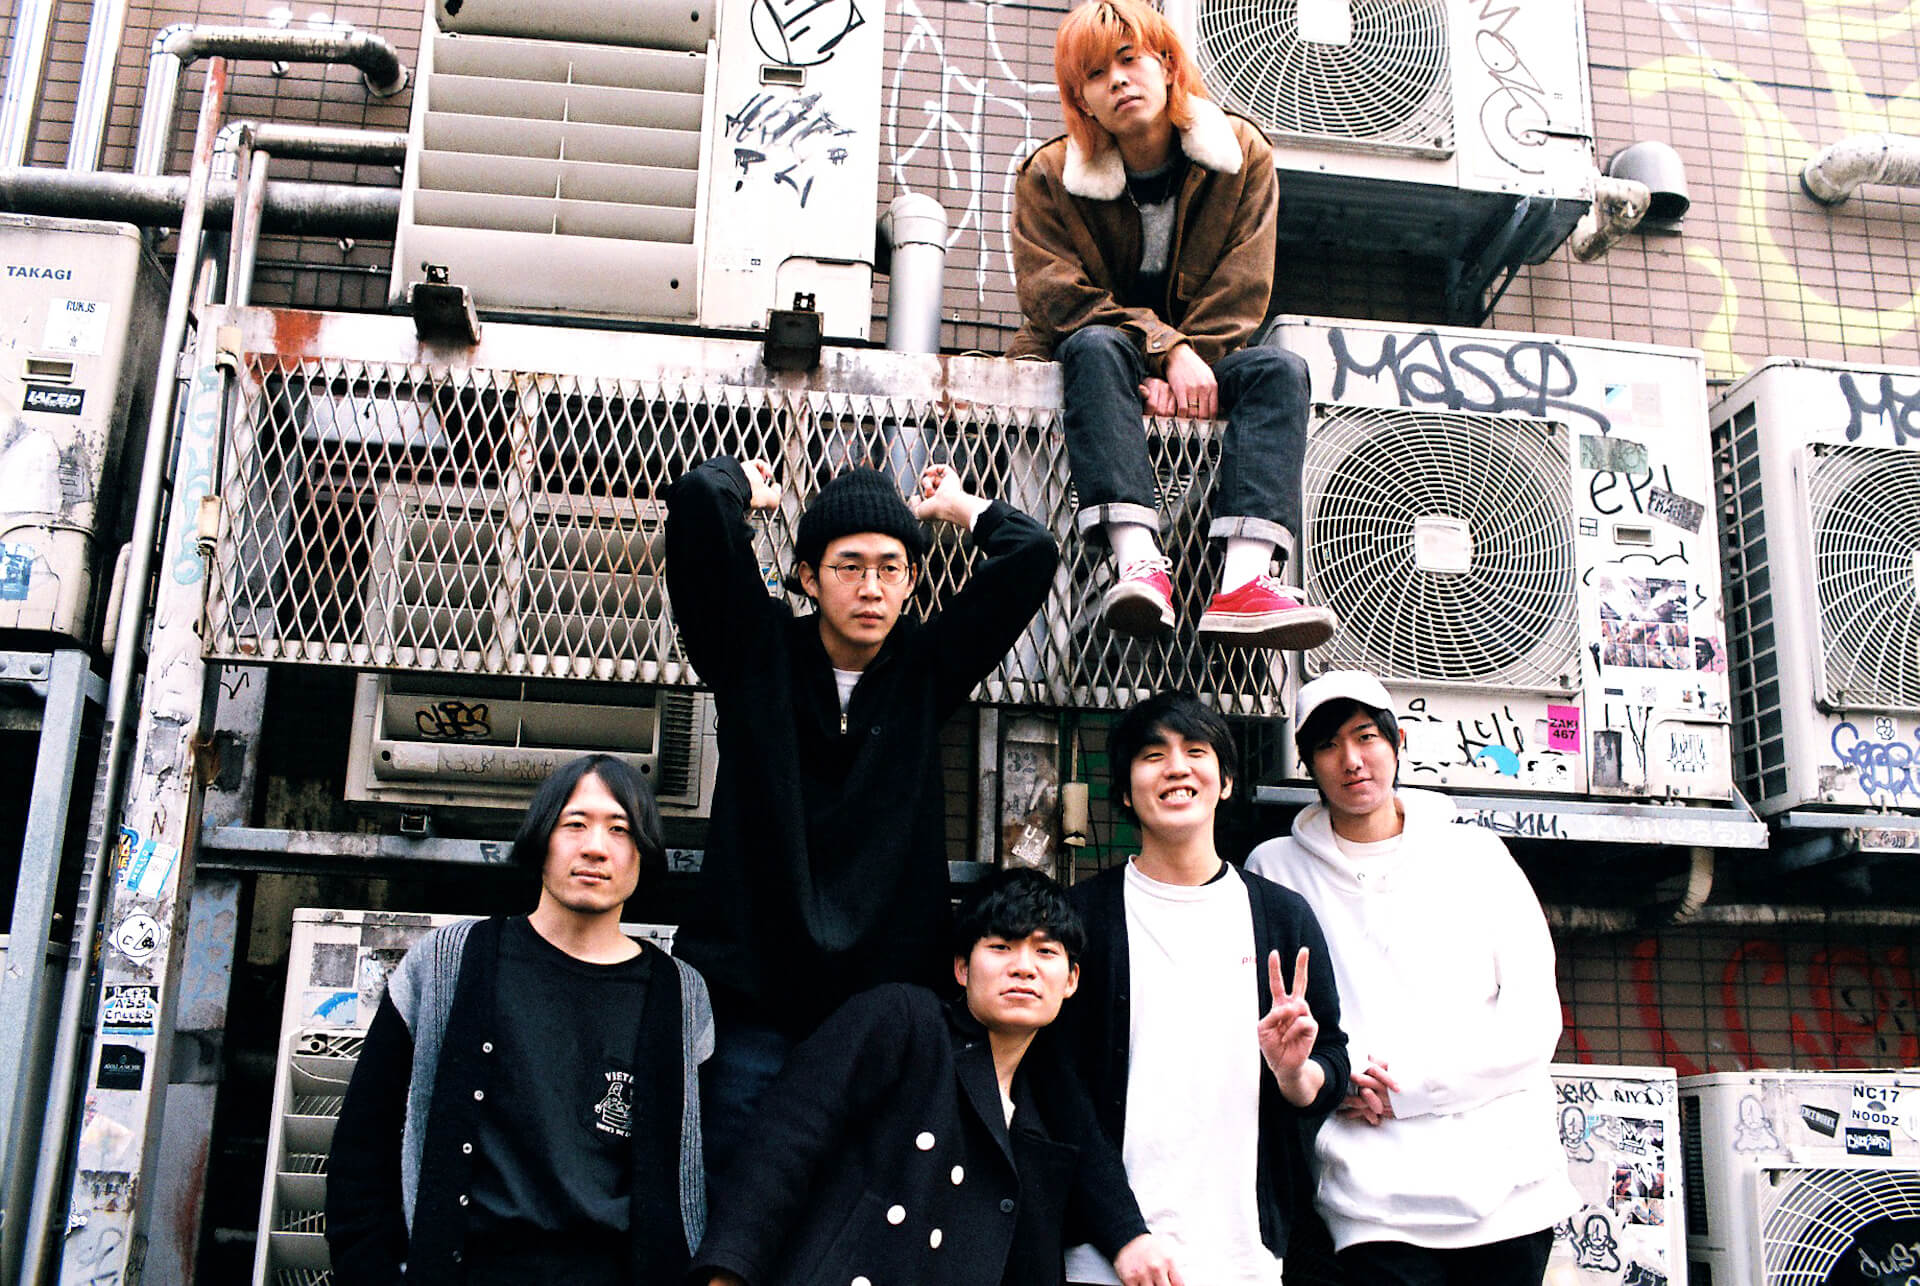 ZONE鼎談|新世代の誕生、6バンド+DJが作る新たなインディシーン interview-zone2-21-1